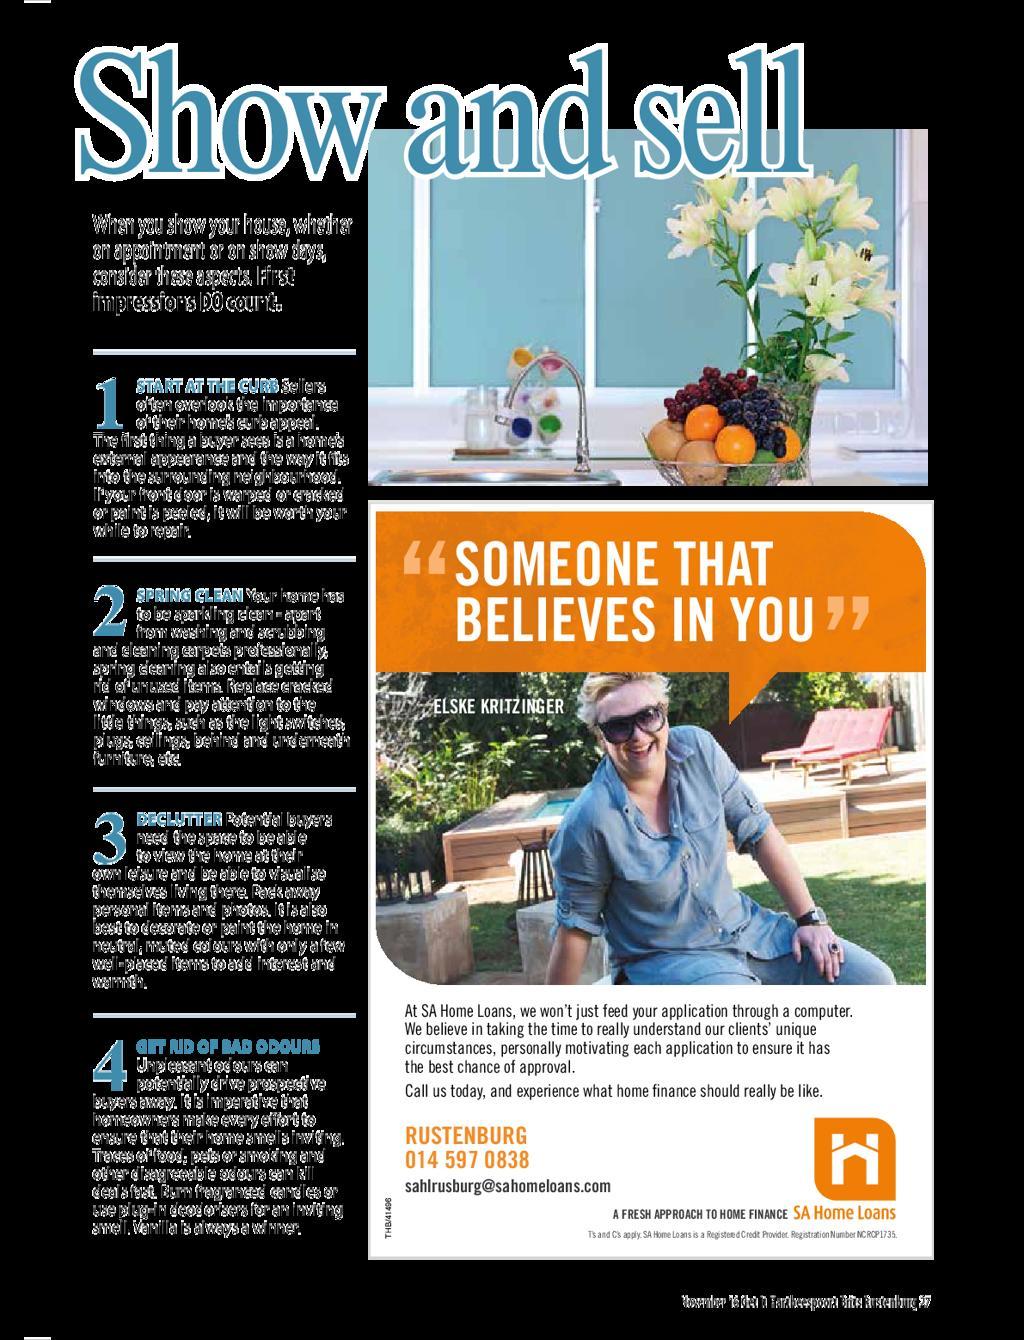 get-it-hartbeespoort-december-2016-epapers-page-37